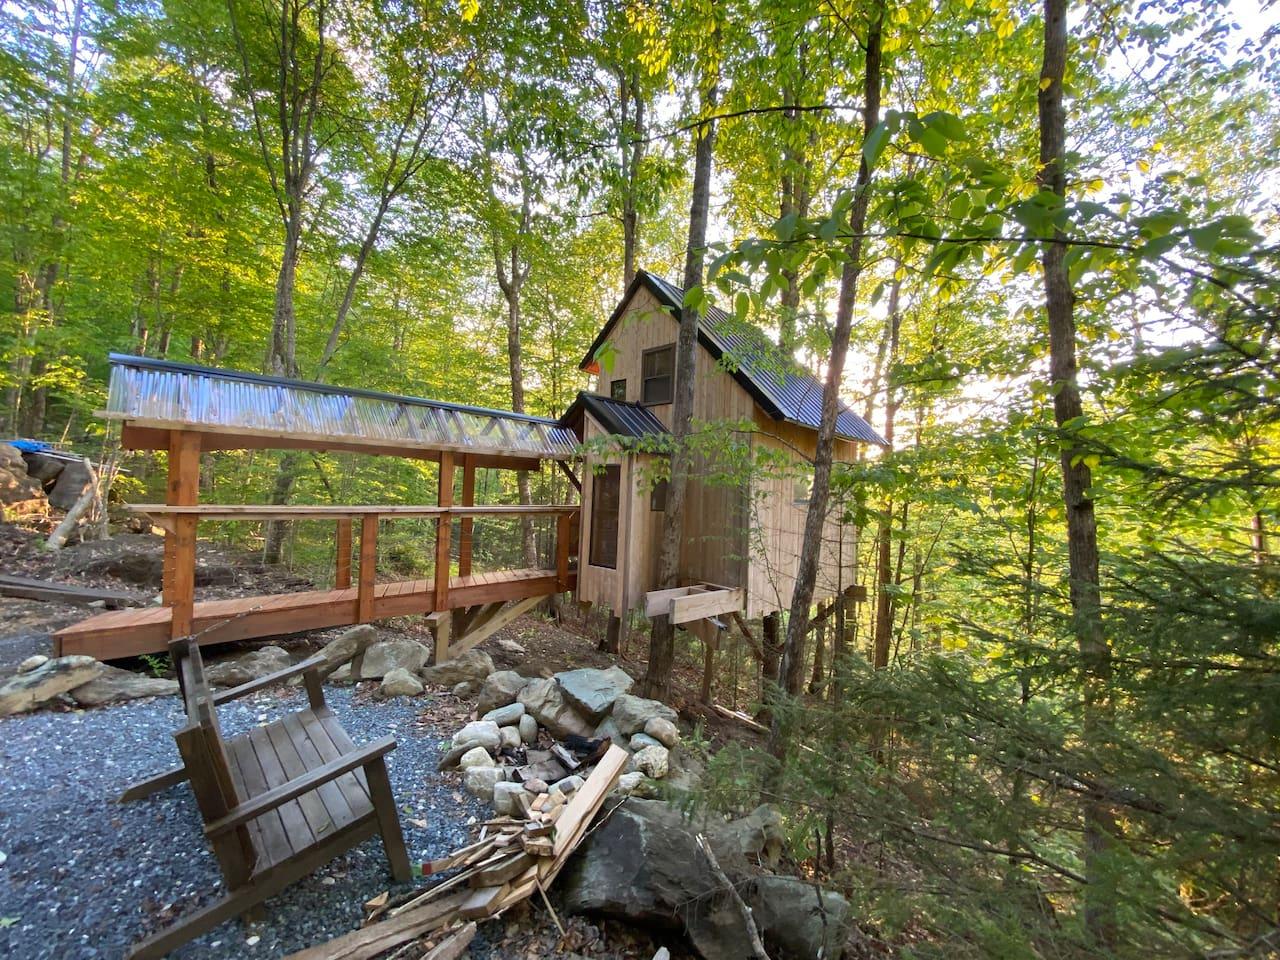 The Sugar Maple Treehouse @ Vermont ReTREEt